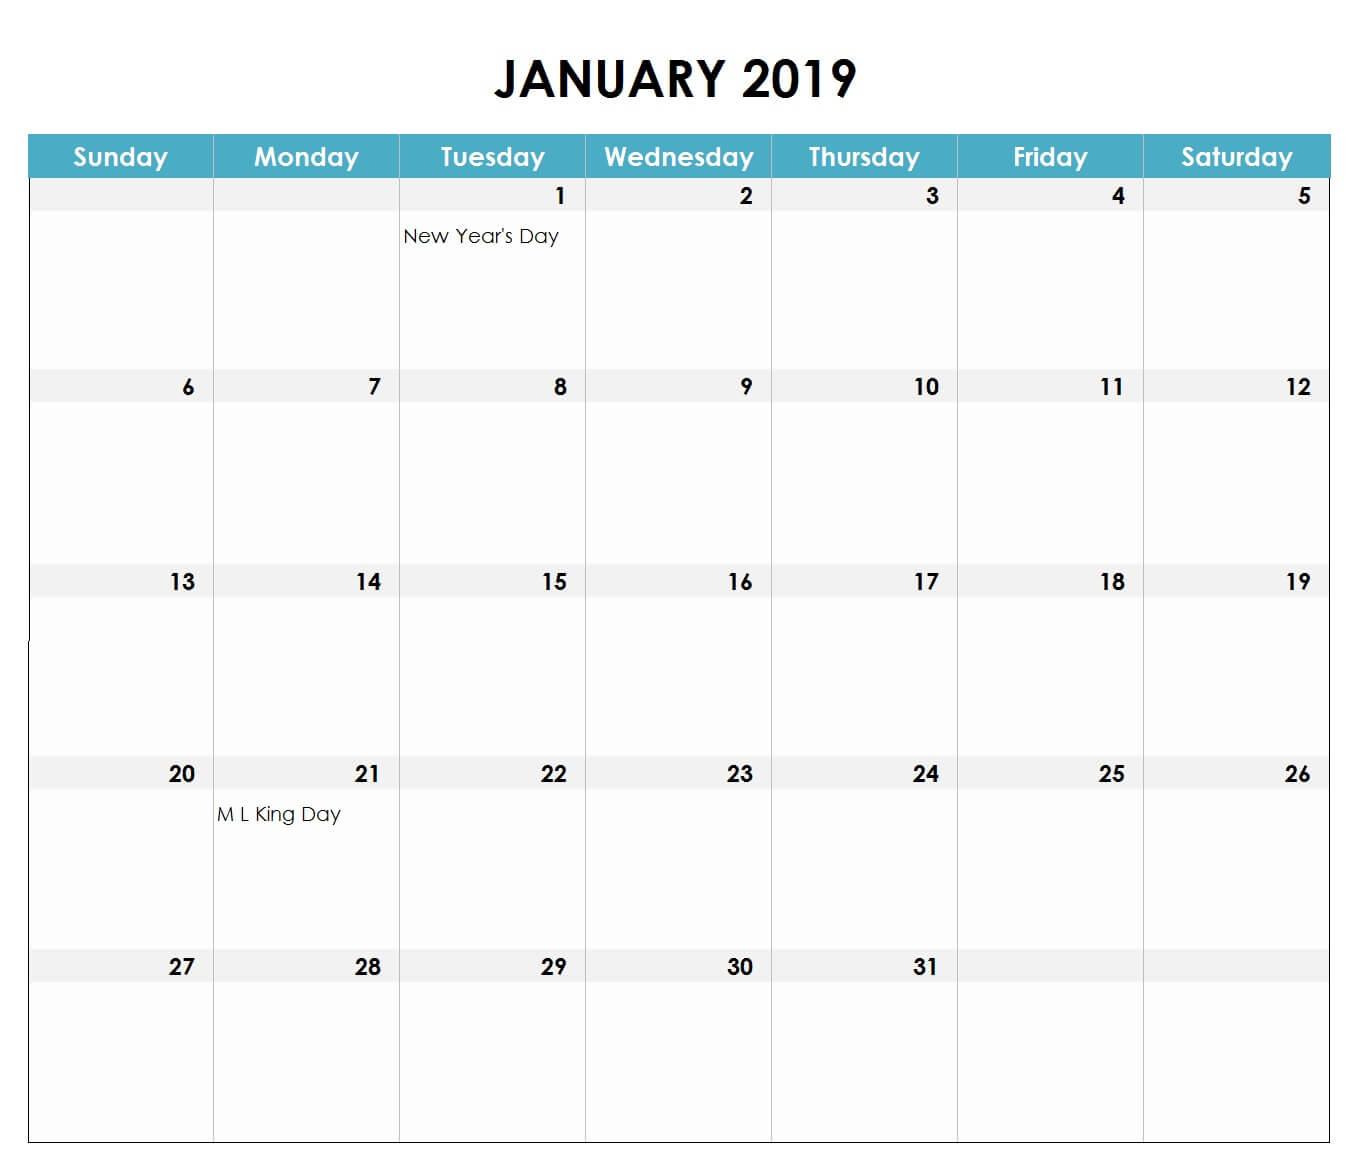 January 2019 Excel Calendar